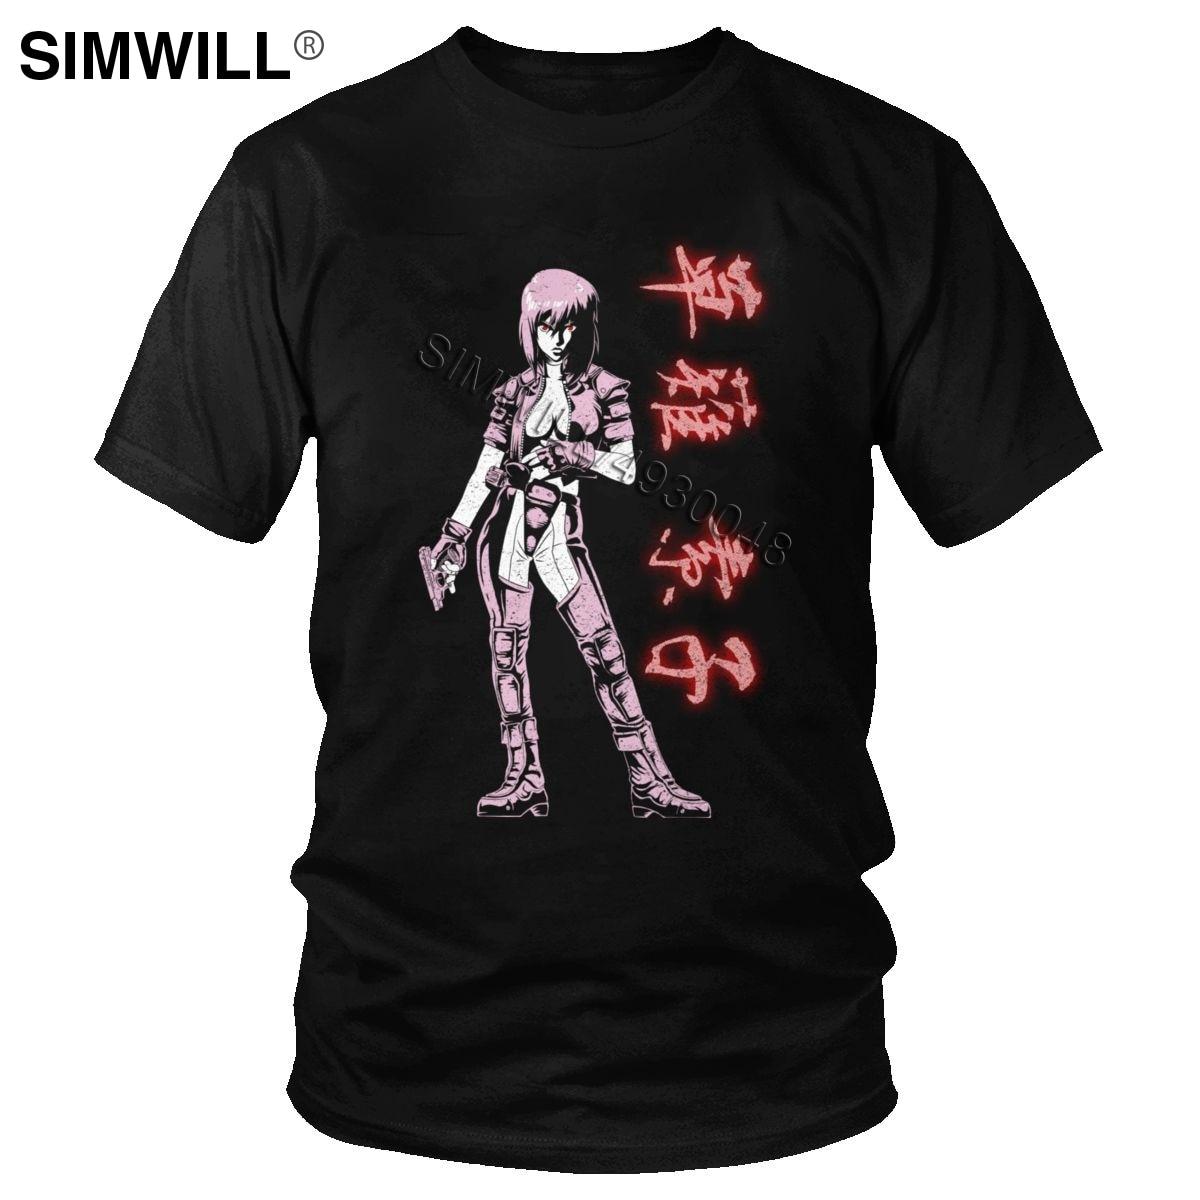 Camiseta de Manga corta de algodón con diseño clásico de fantasma en la cáscara para hombre, camiseta de Manga Anime de mayor Kusanagi, camiseta de regalo de Motoko